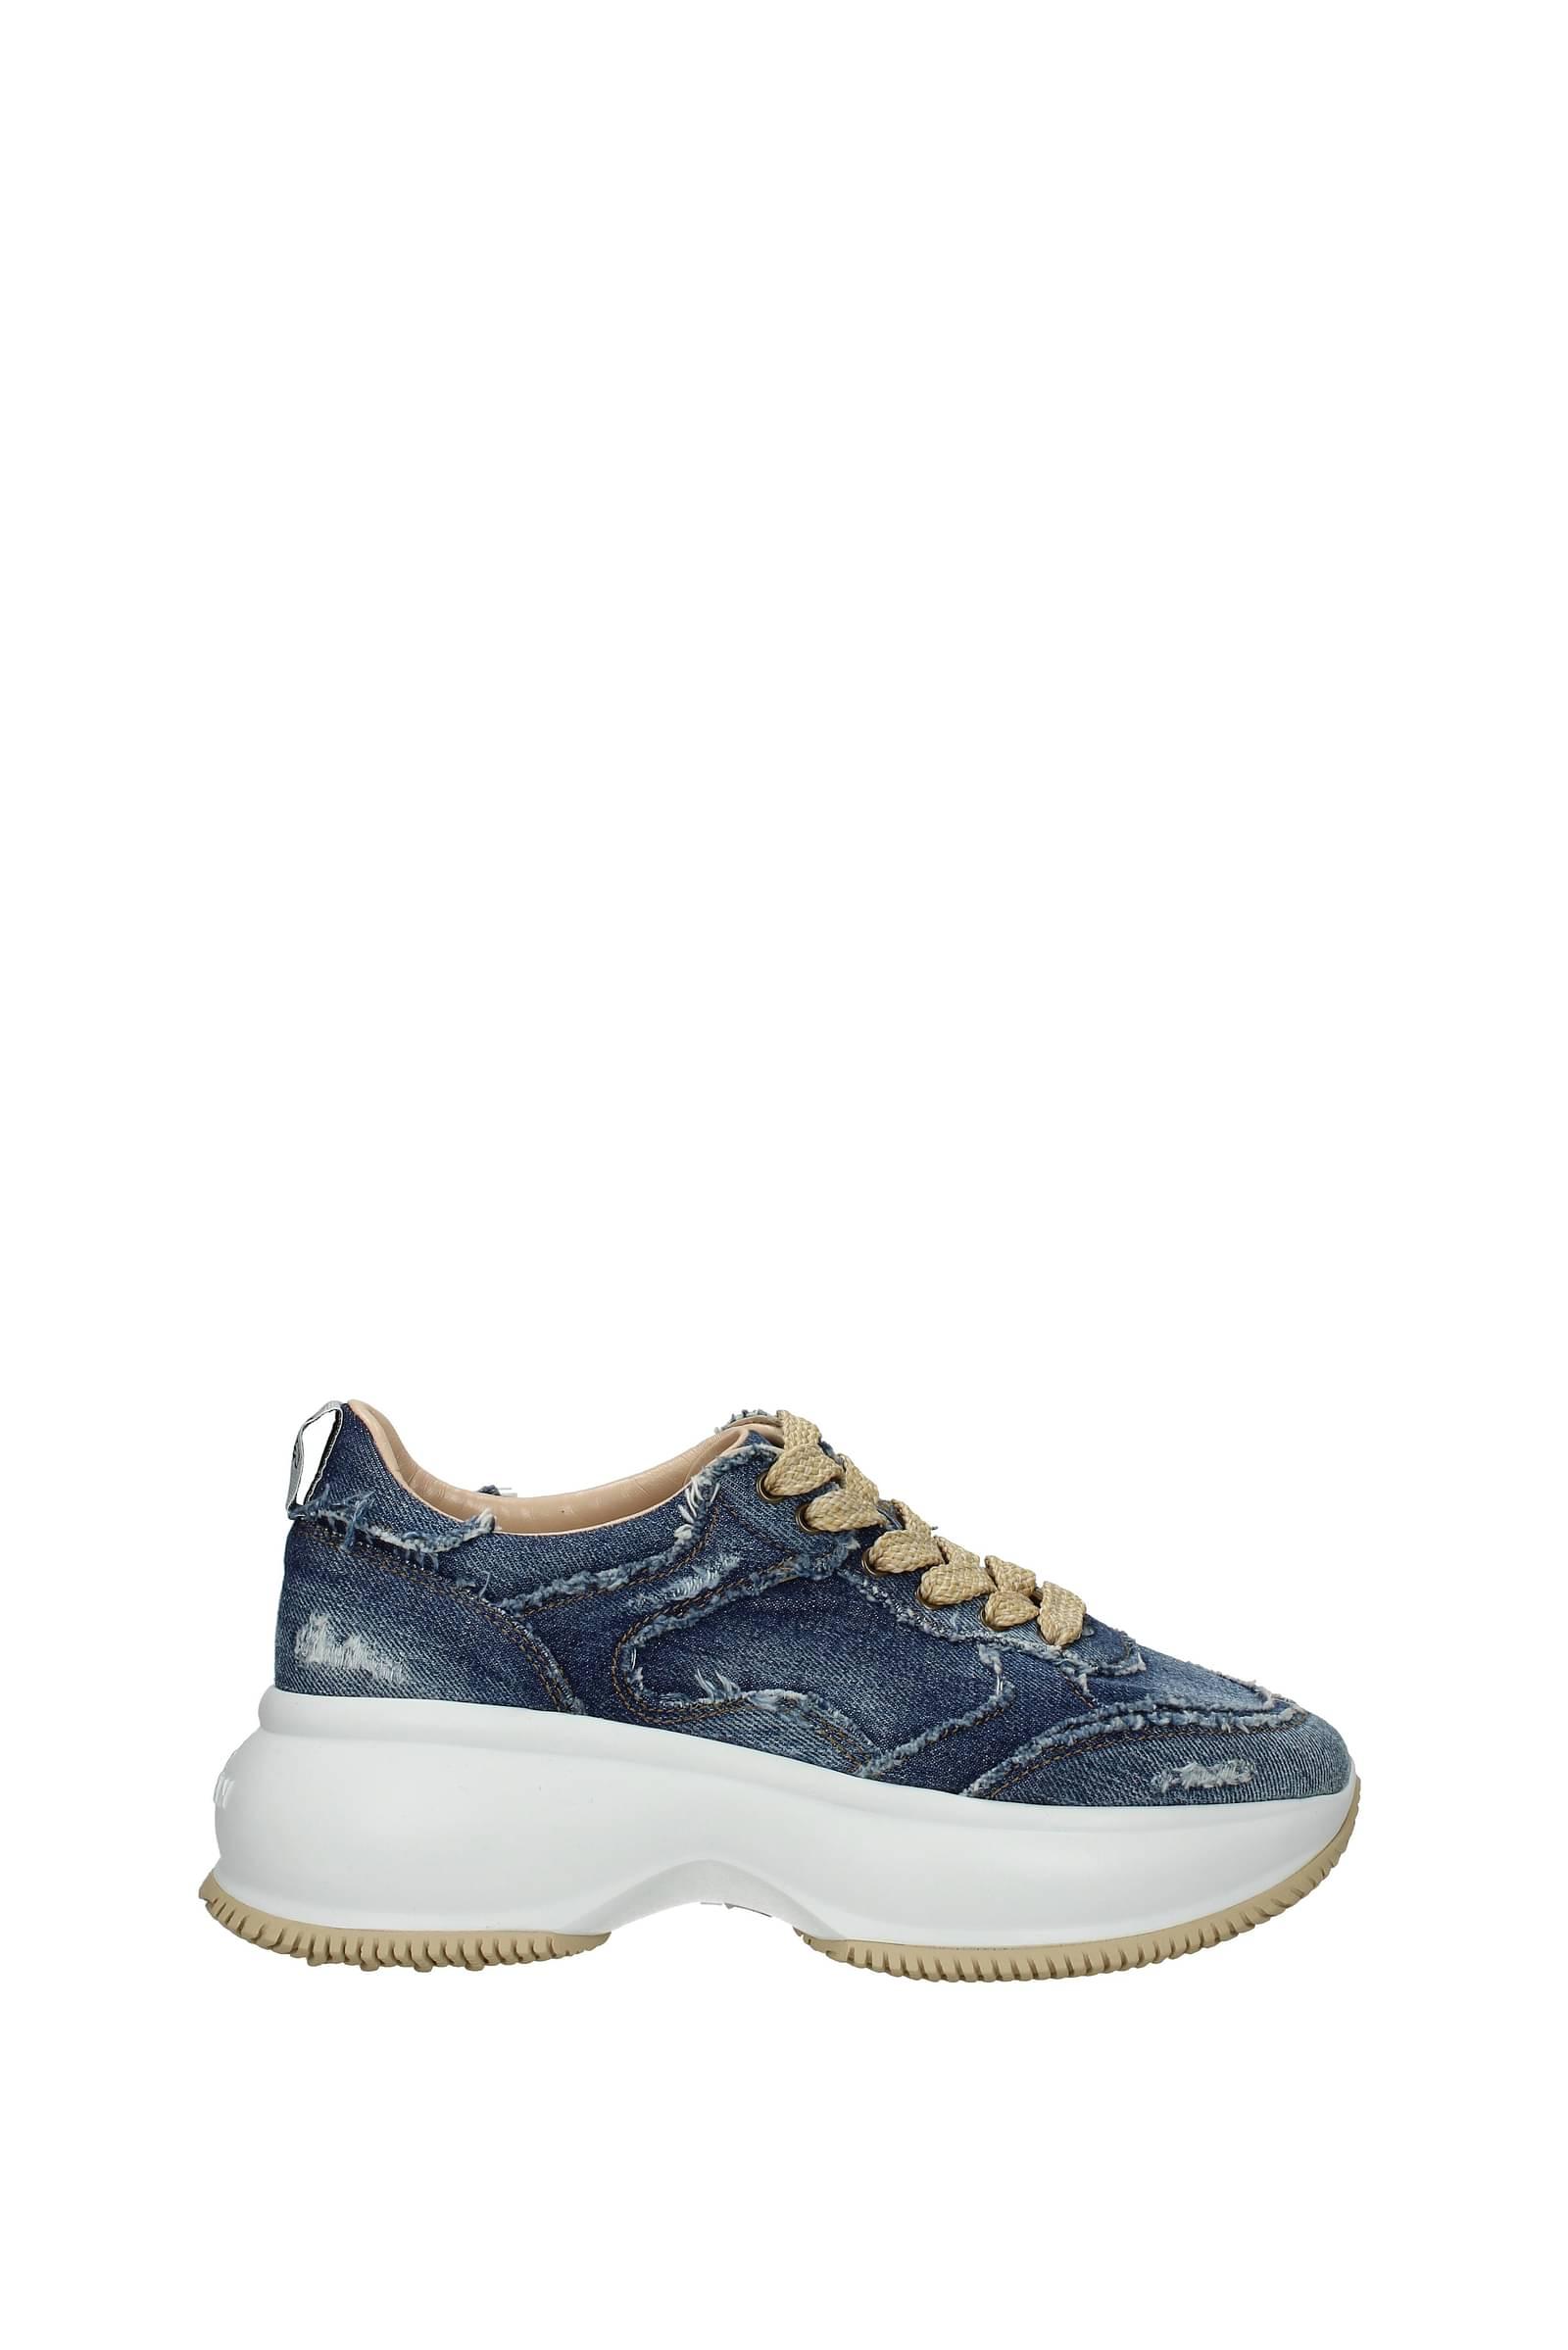 Hogan Sneakers maxi i active Women HXW4350BP20JDL9999 Fabric 218,4€